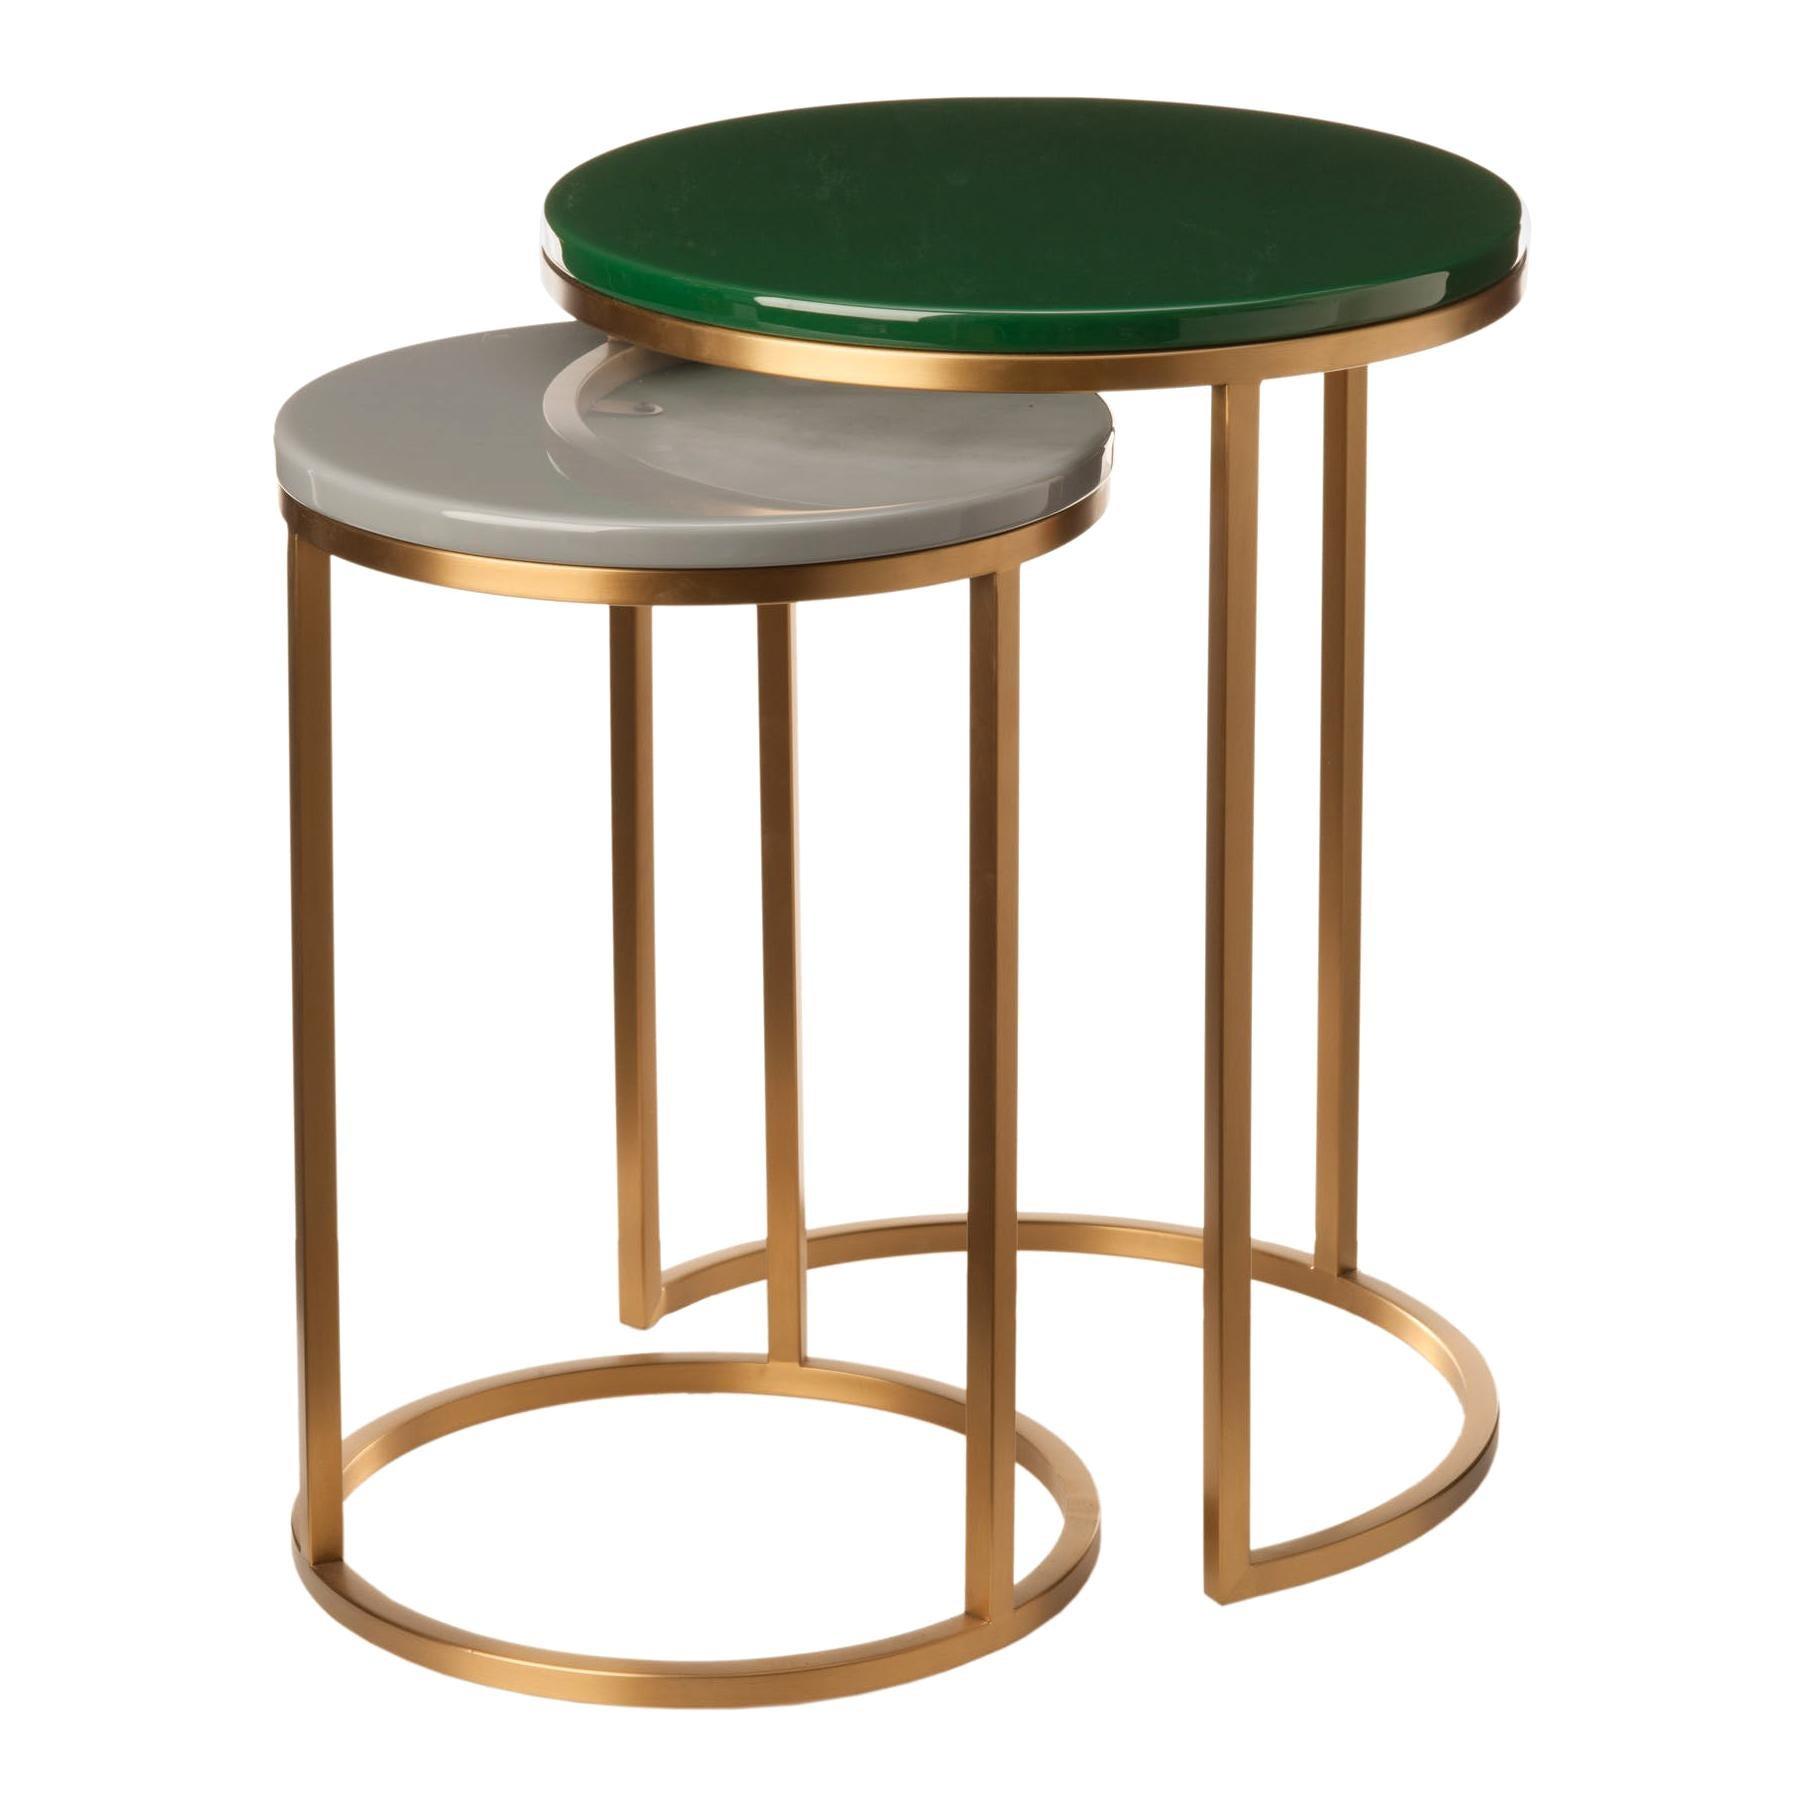 Modern Glossy Side Table, Pols Potten Studio